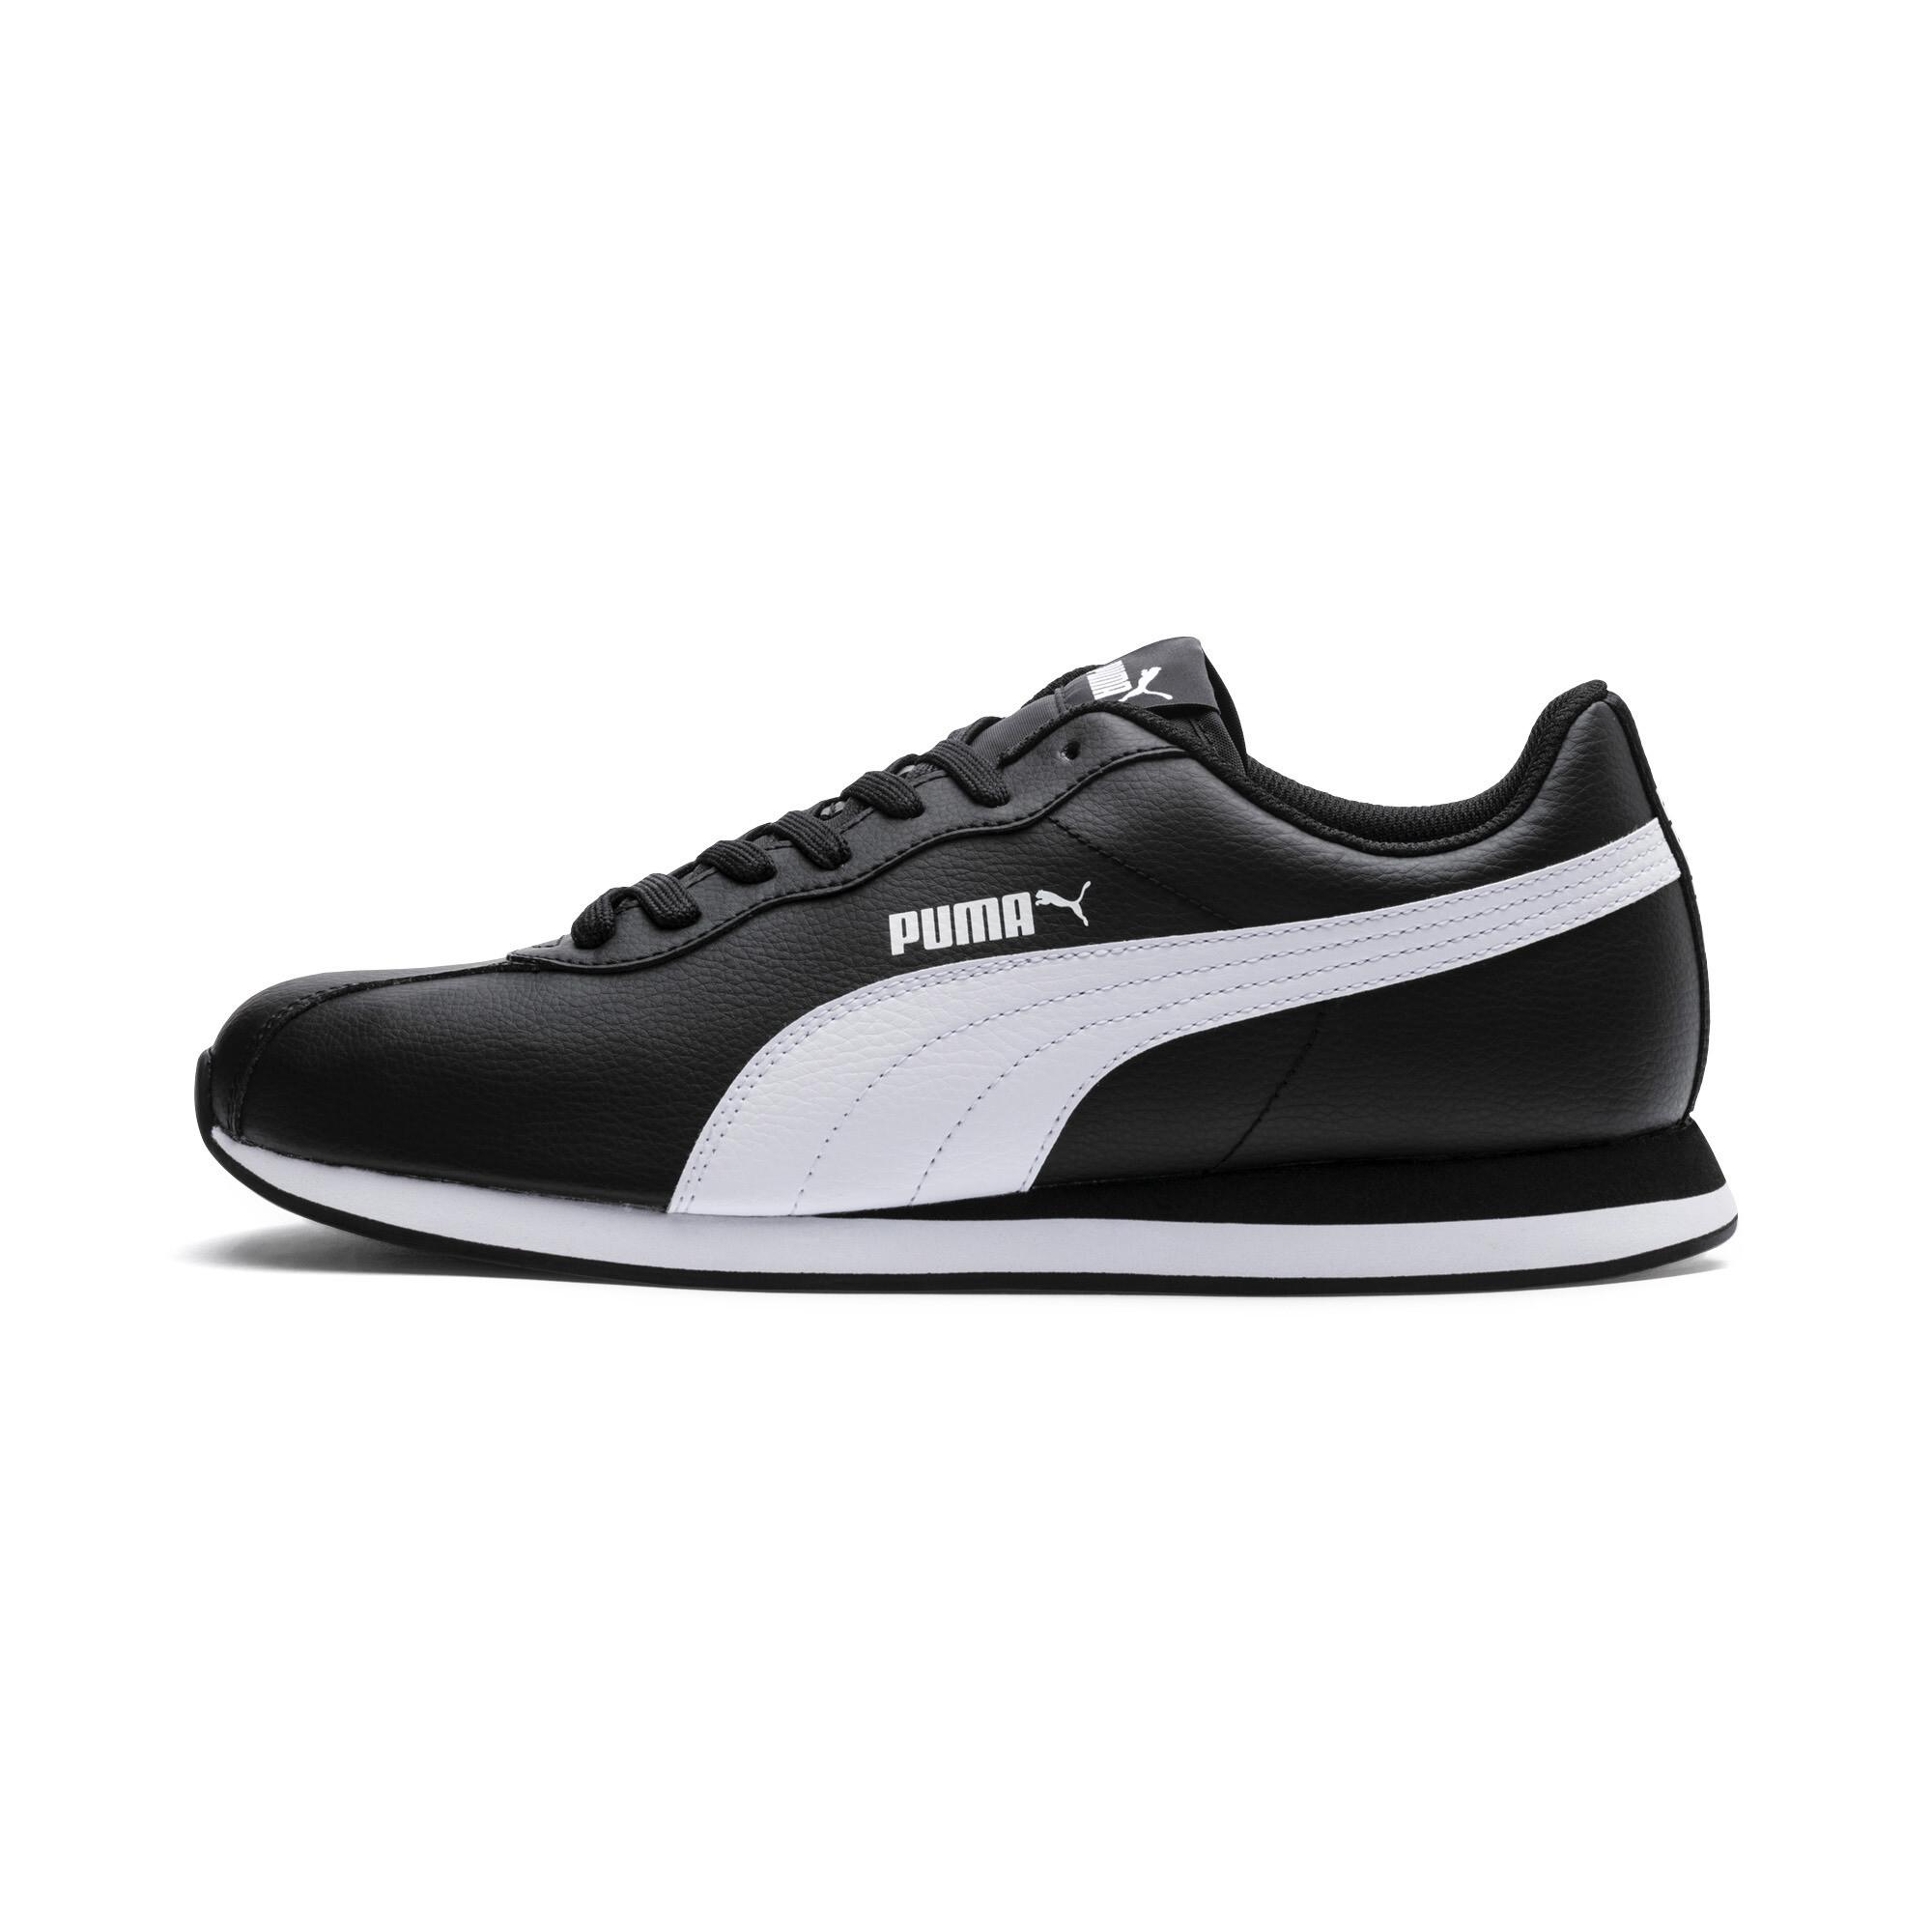 thumbnail 45 - PUMA Men's Turin II Sneakers